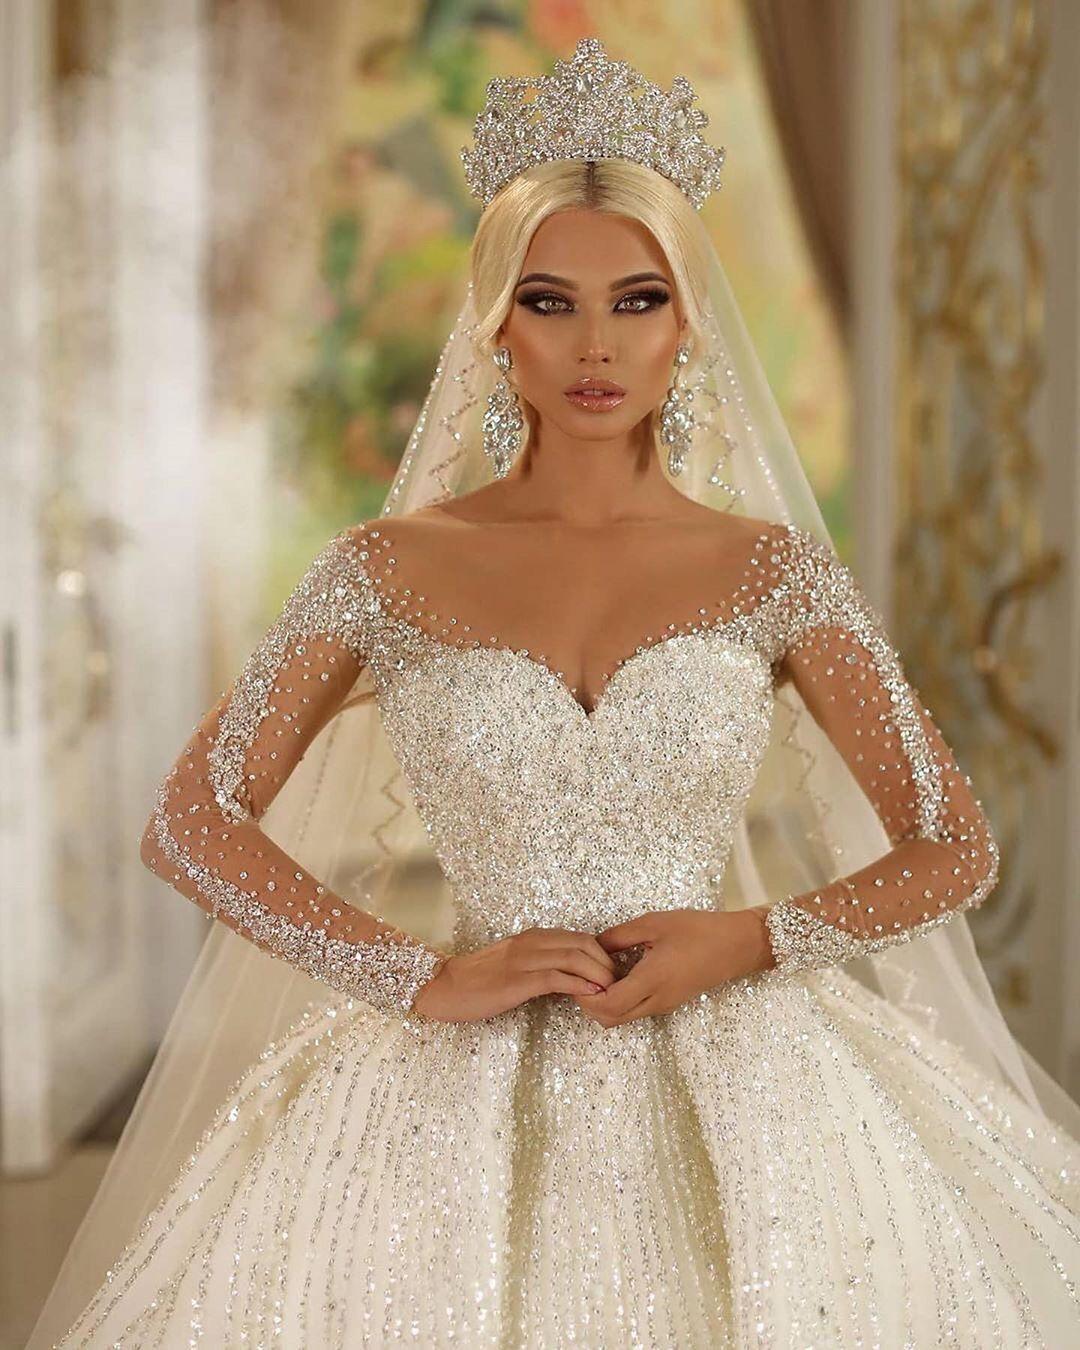 Cincaidotcom Bridal Shop On Instagram I Like I Share I Sell Usd1 250 Follow In 2021 Princess Wedding Dresses Fancy Wedding Dresses Sparkly Wedding Dress [ 1350 x 1080 Pixel ]